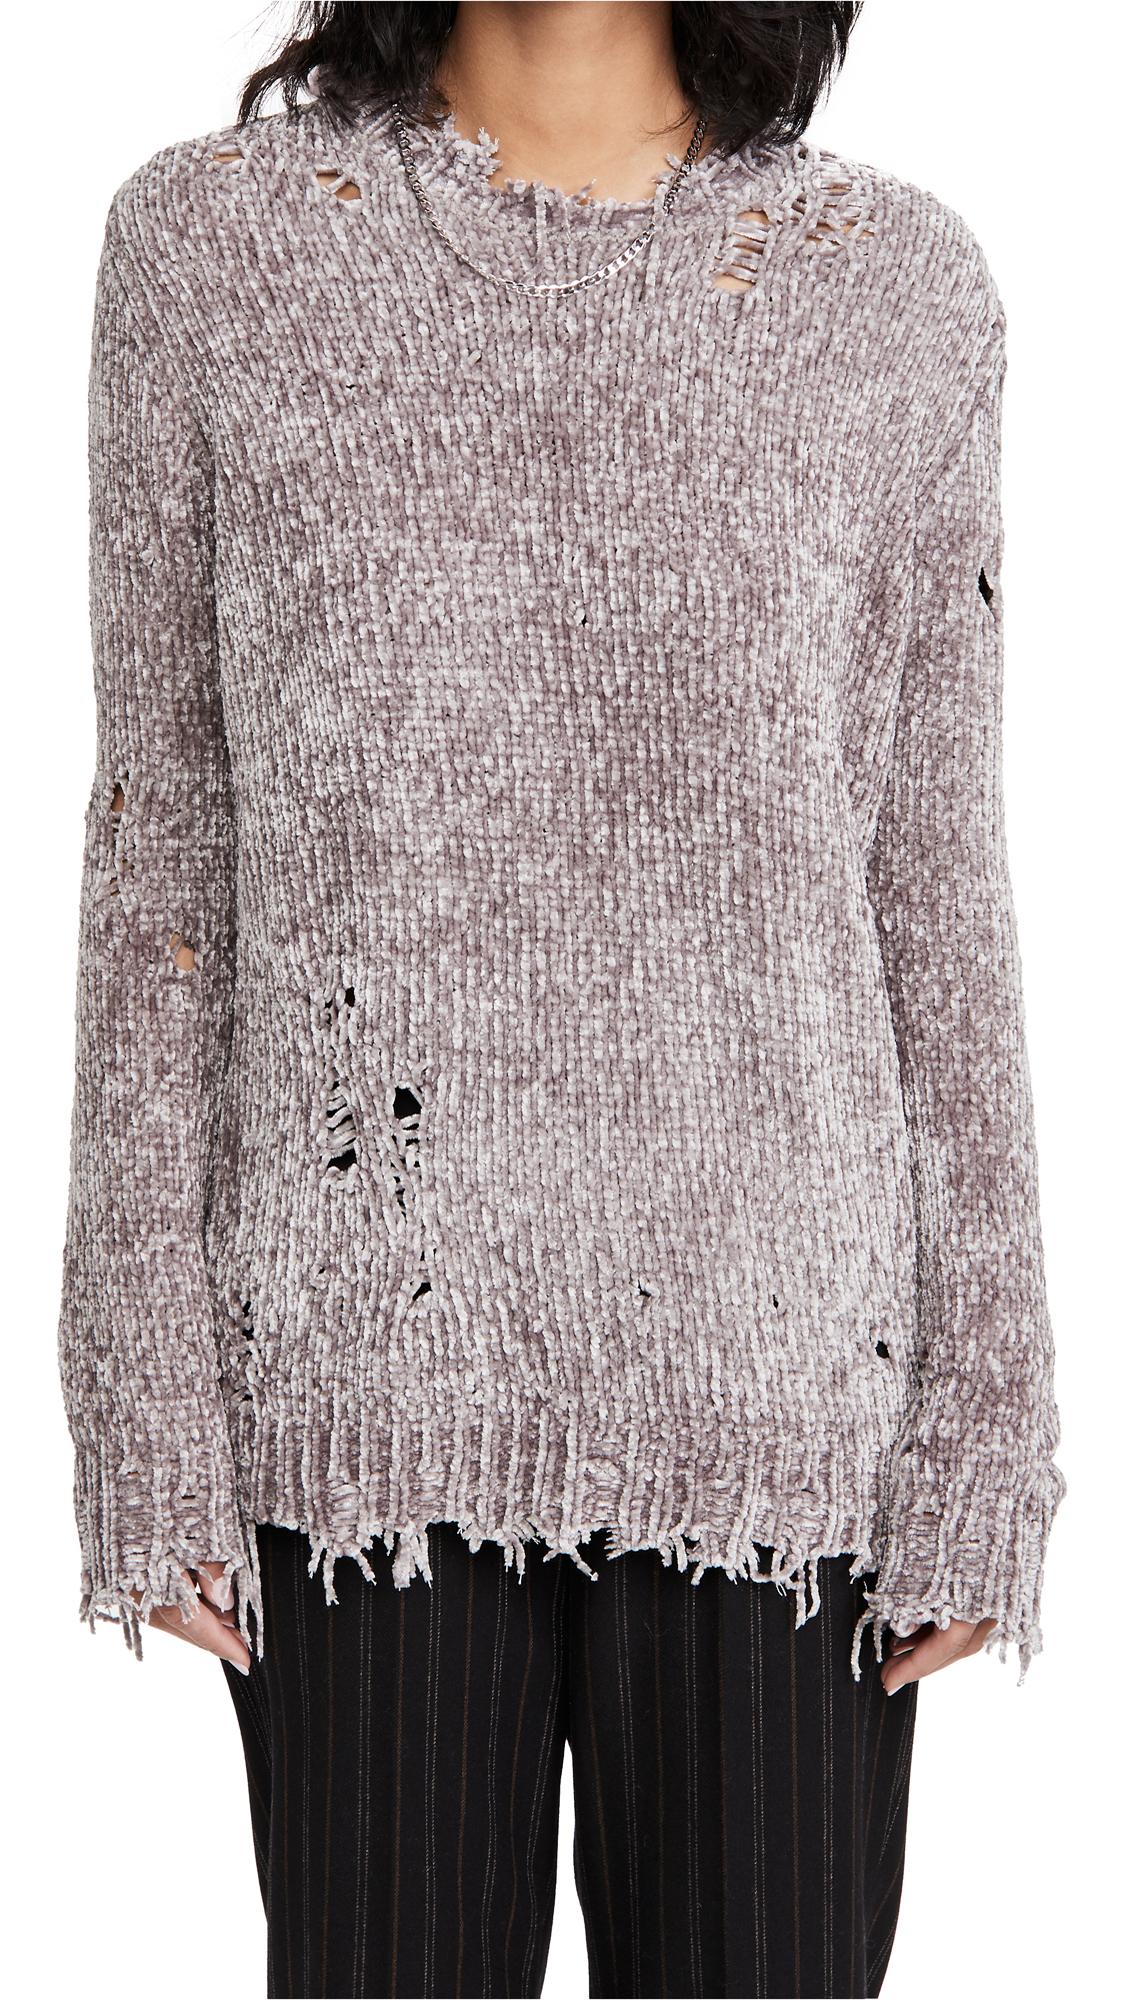 R13 Distressed Chenille Crew Neck Sweater